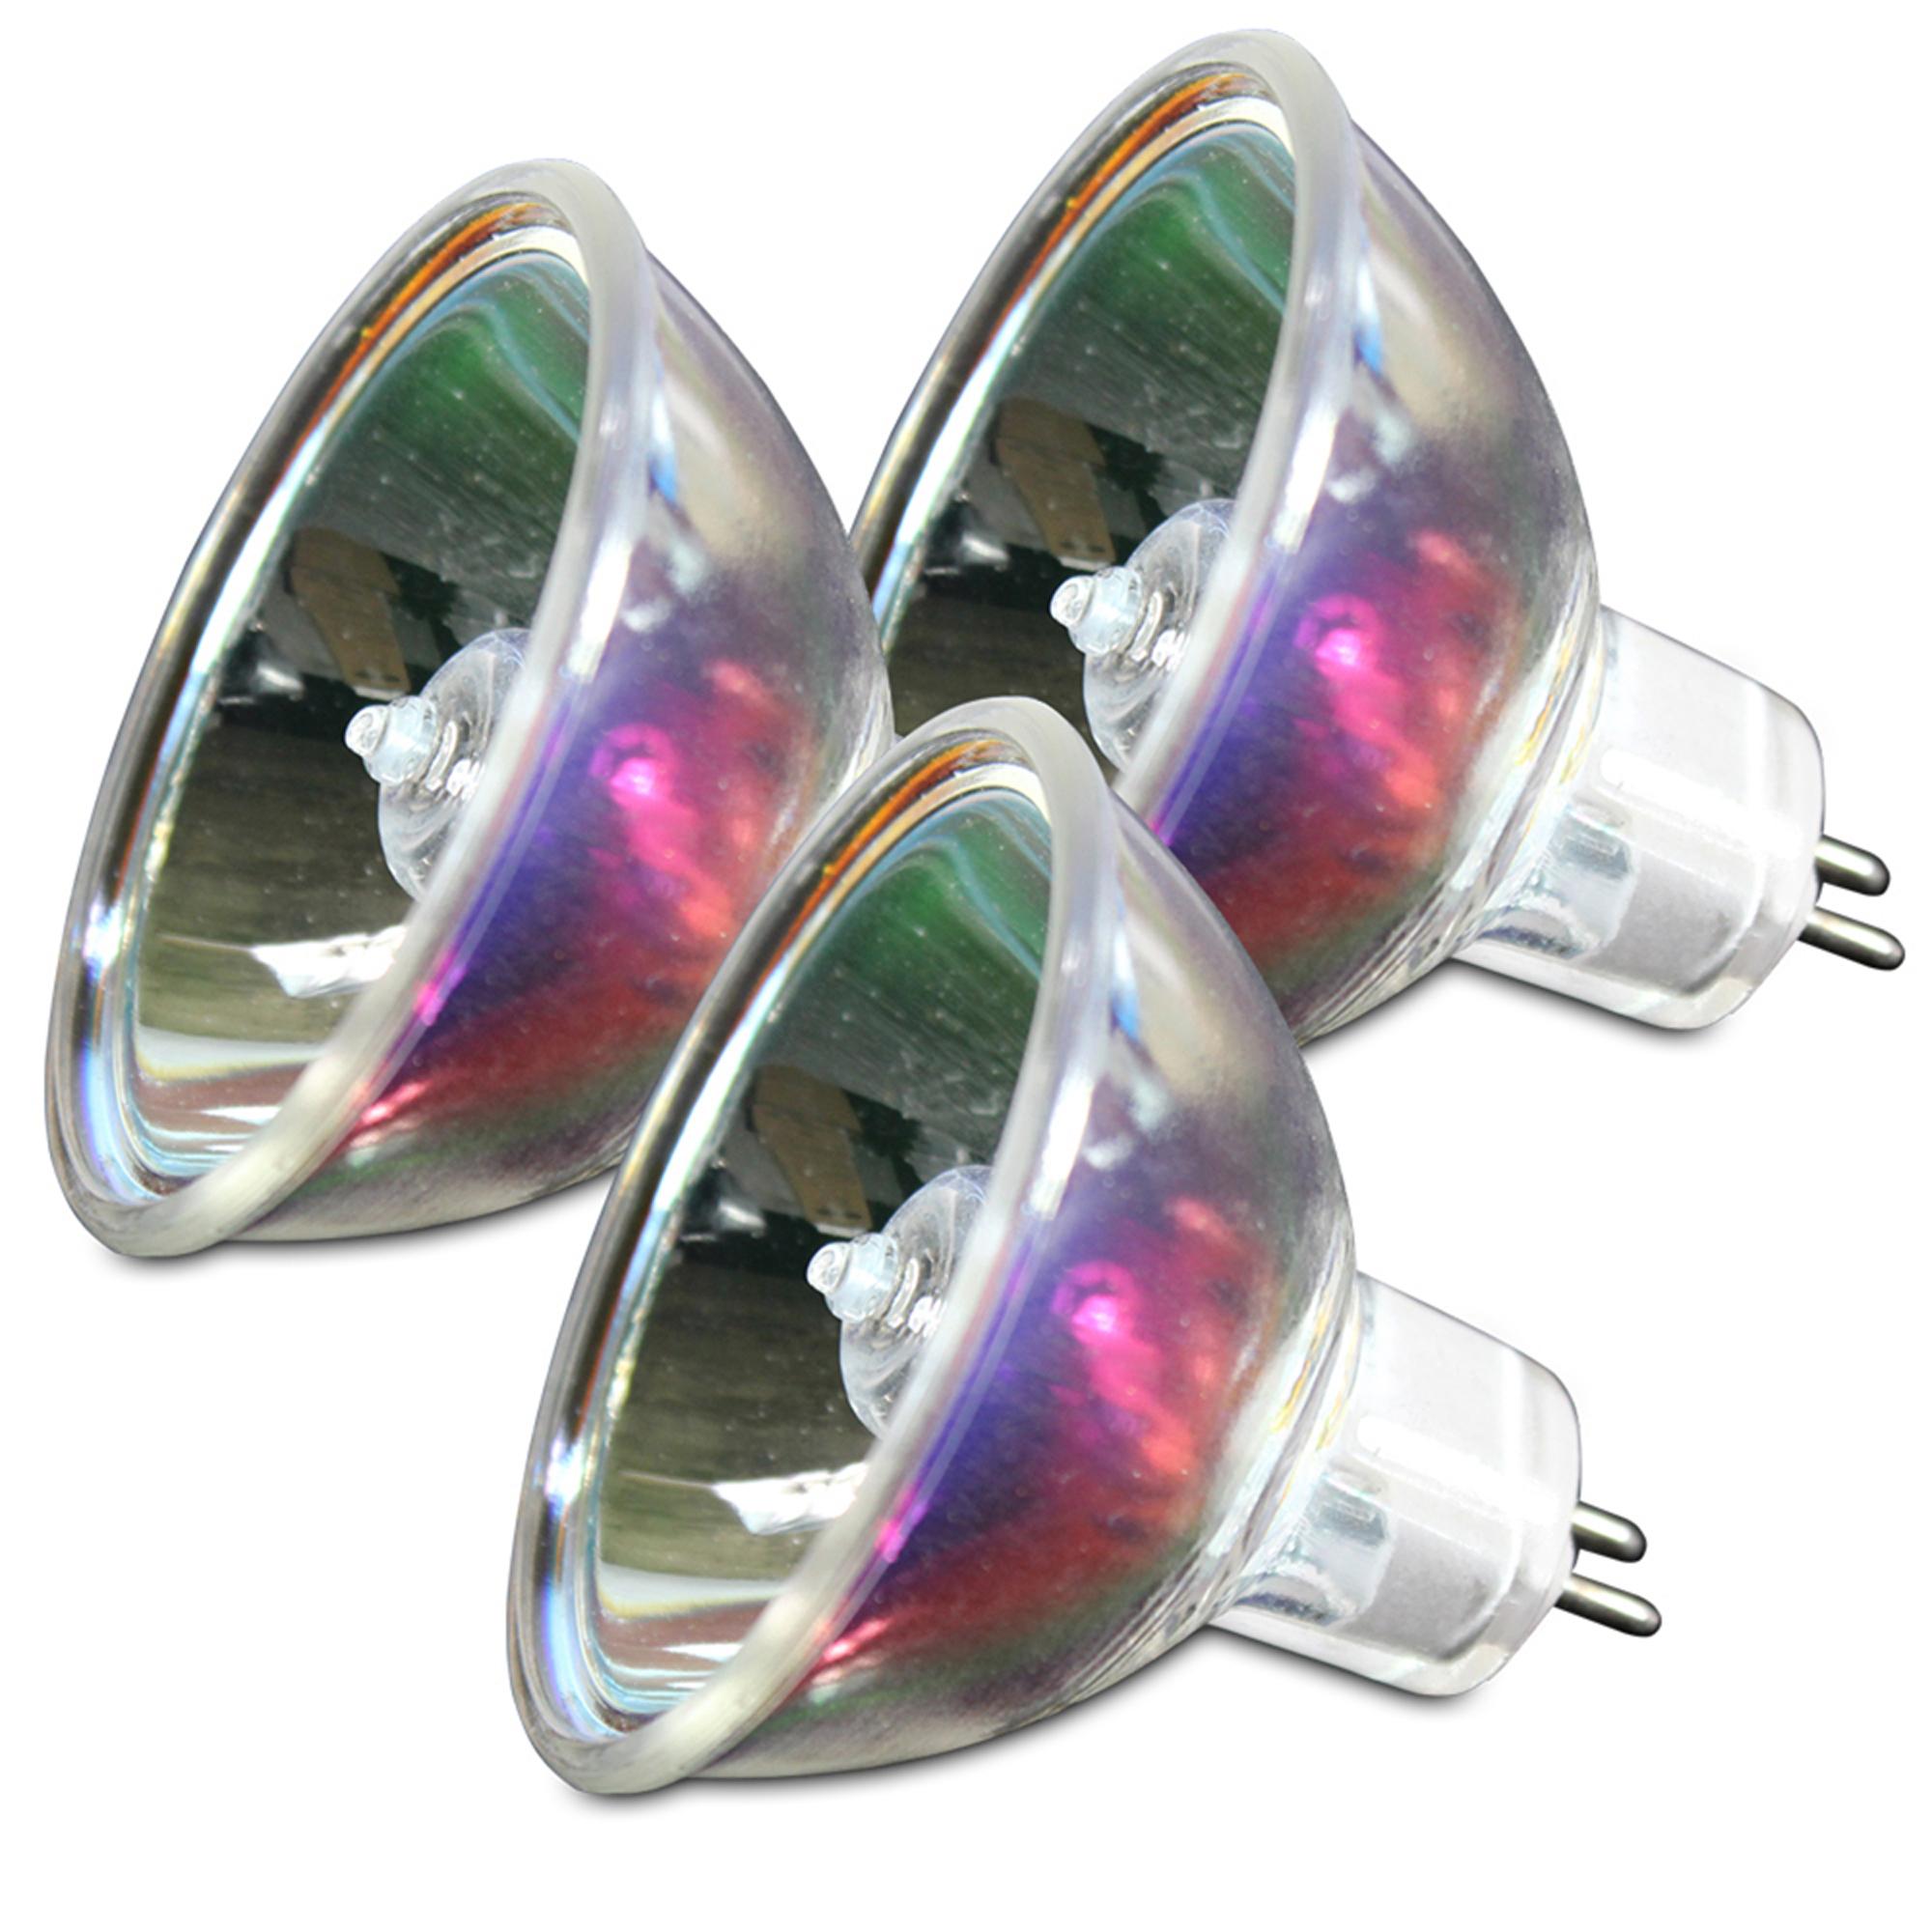 FX Lab G016ZLR 24V Dichroic Lamp, Set of 3